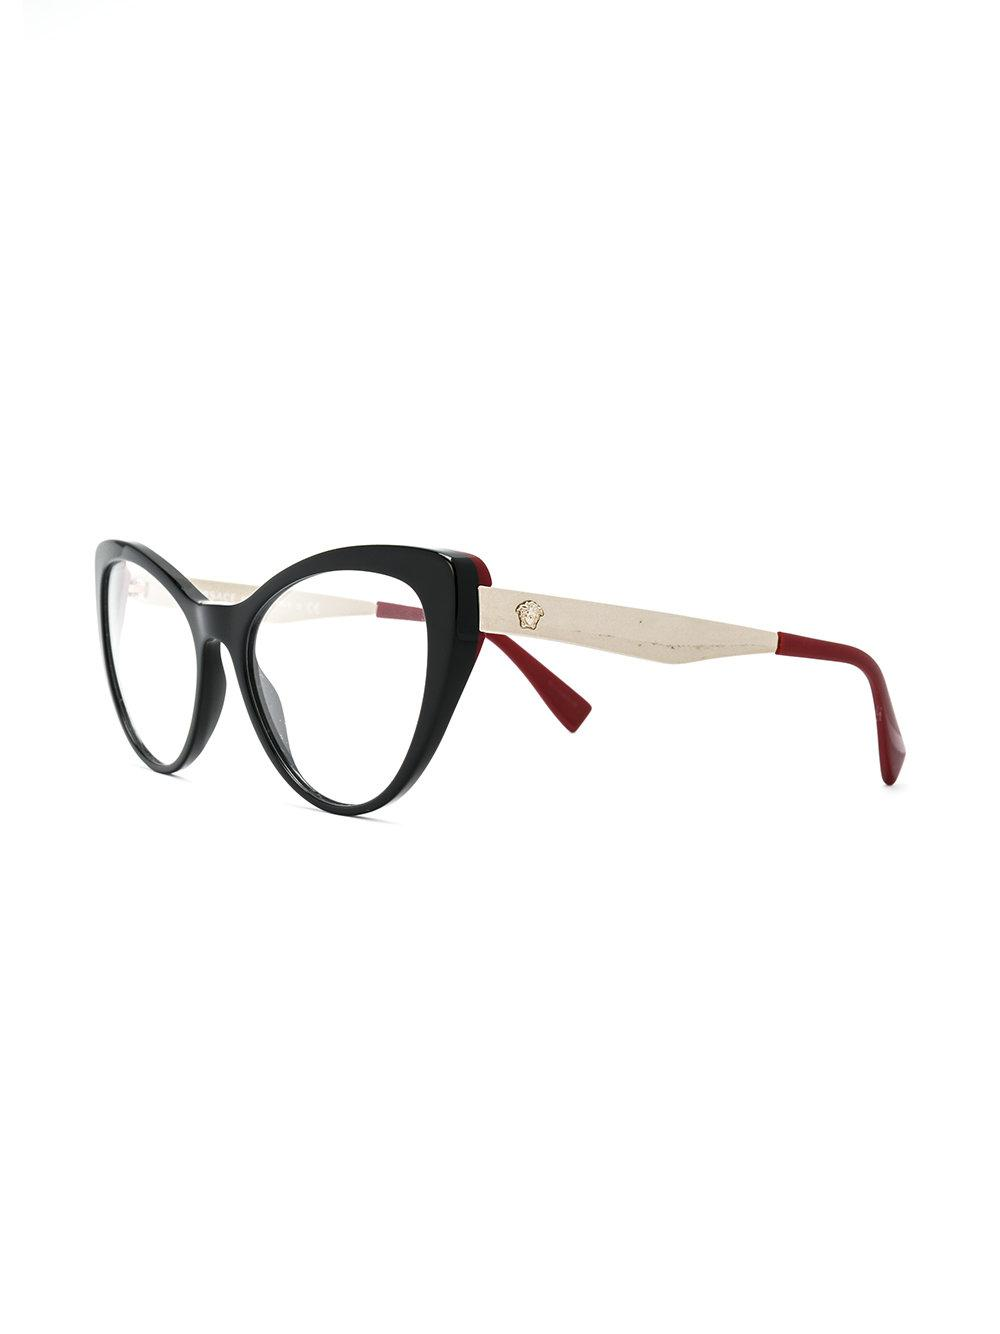 acfe1c7372b8d Lyst - Versace Classic Cat Eye Glasses in Black